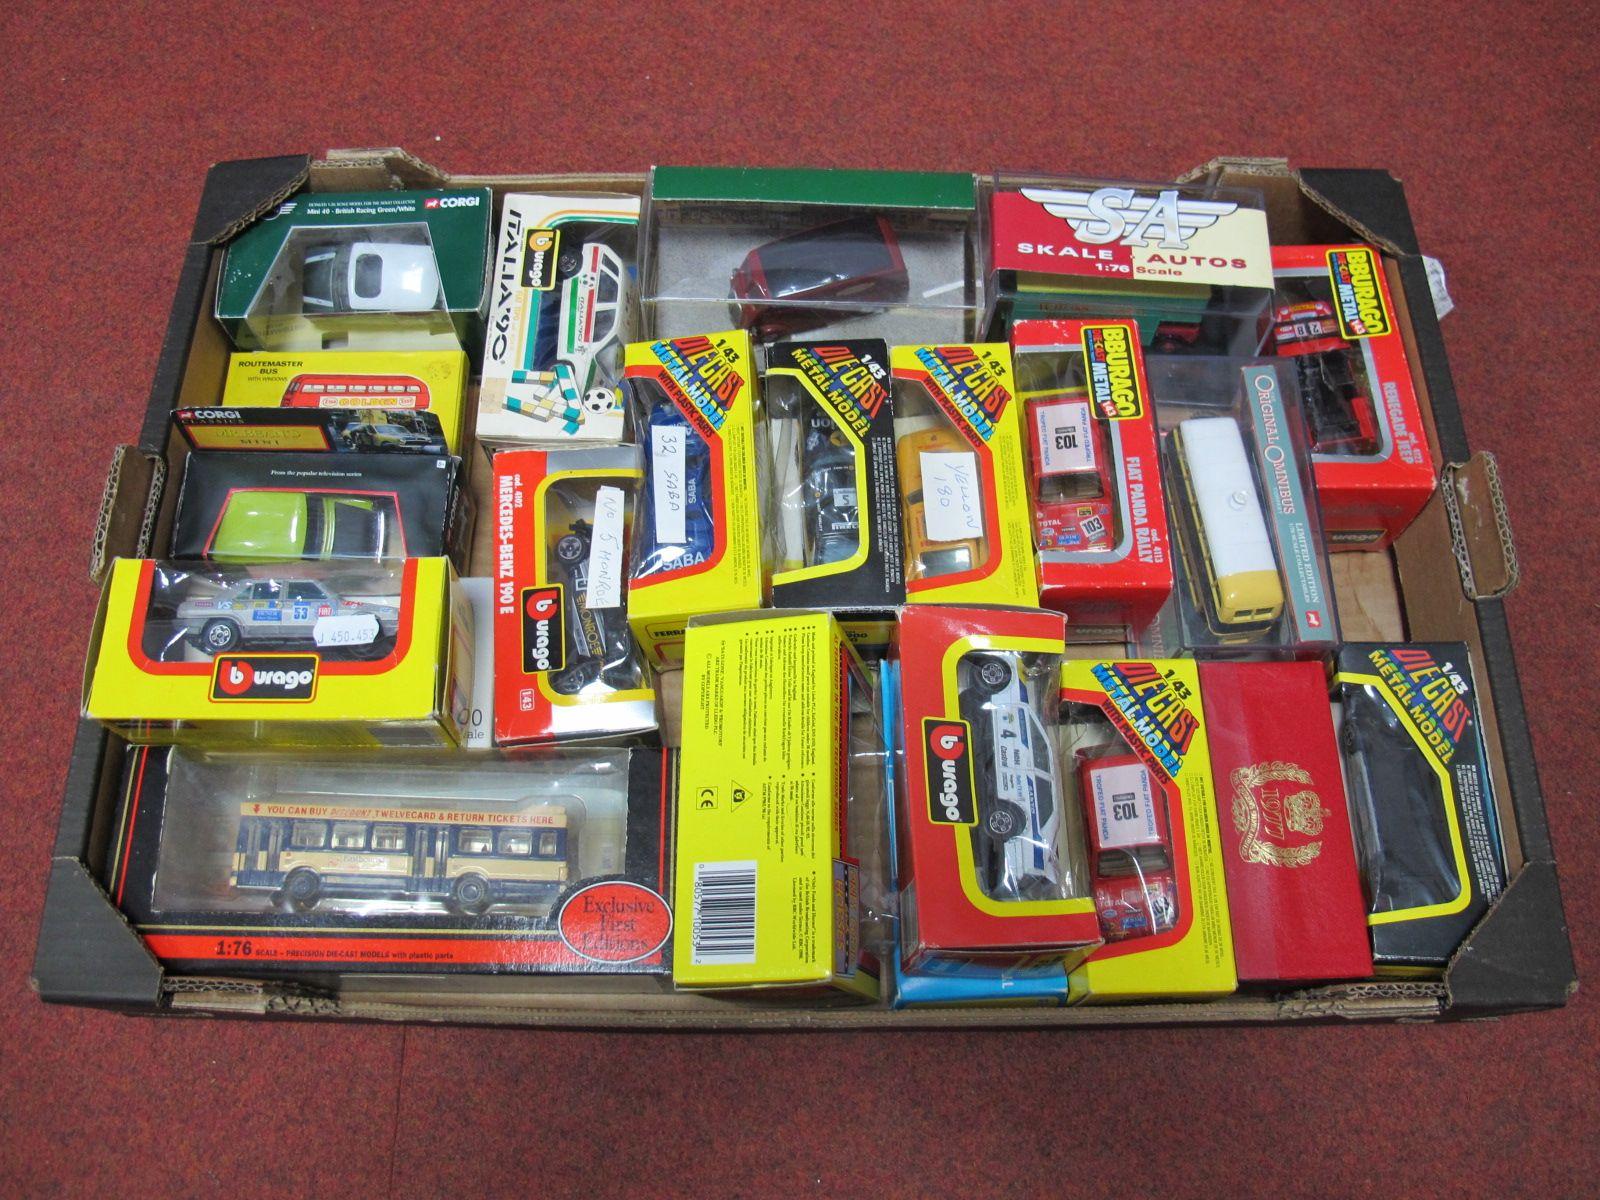 Lot 42 - Twenty-Two Diecast Vehicles by EFE, Burago, Skale Autos, Corgi, Lonestar, including EFE MKI